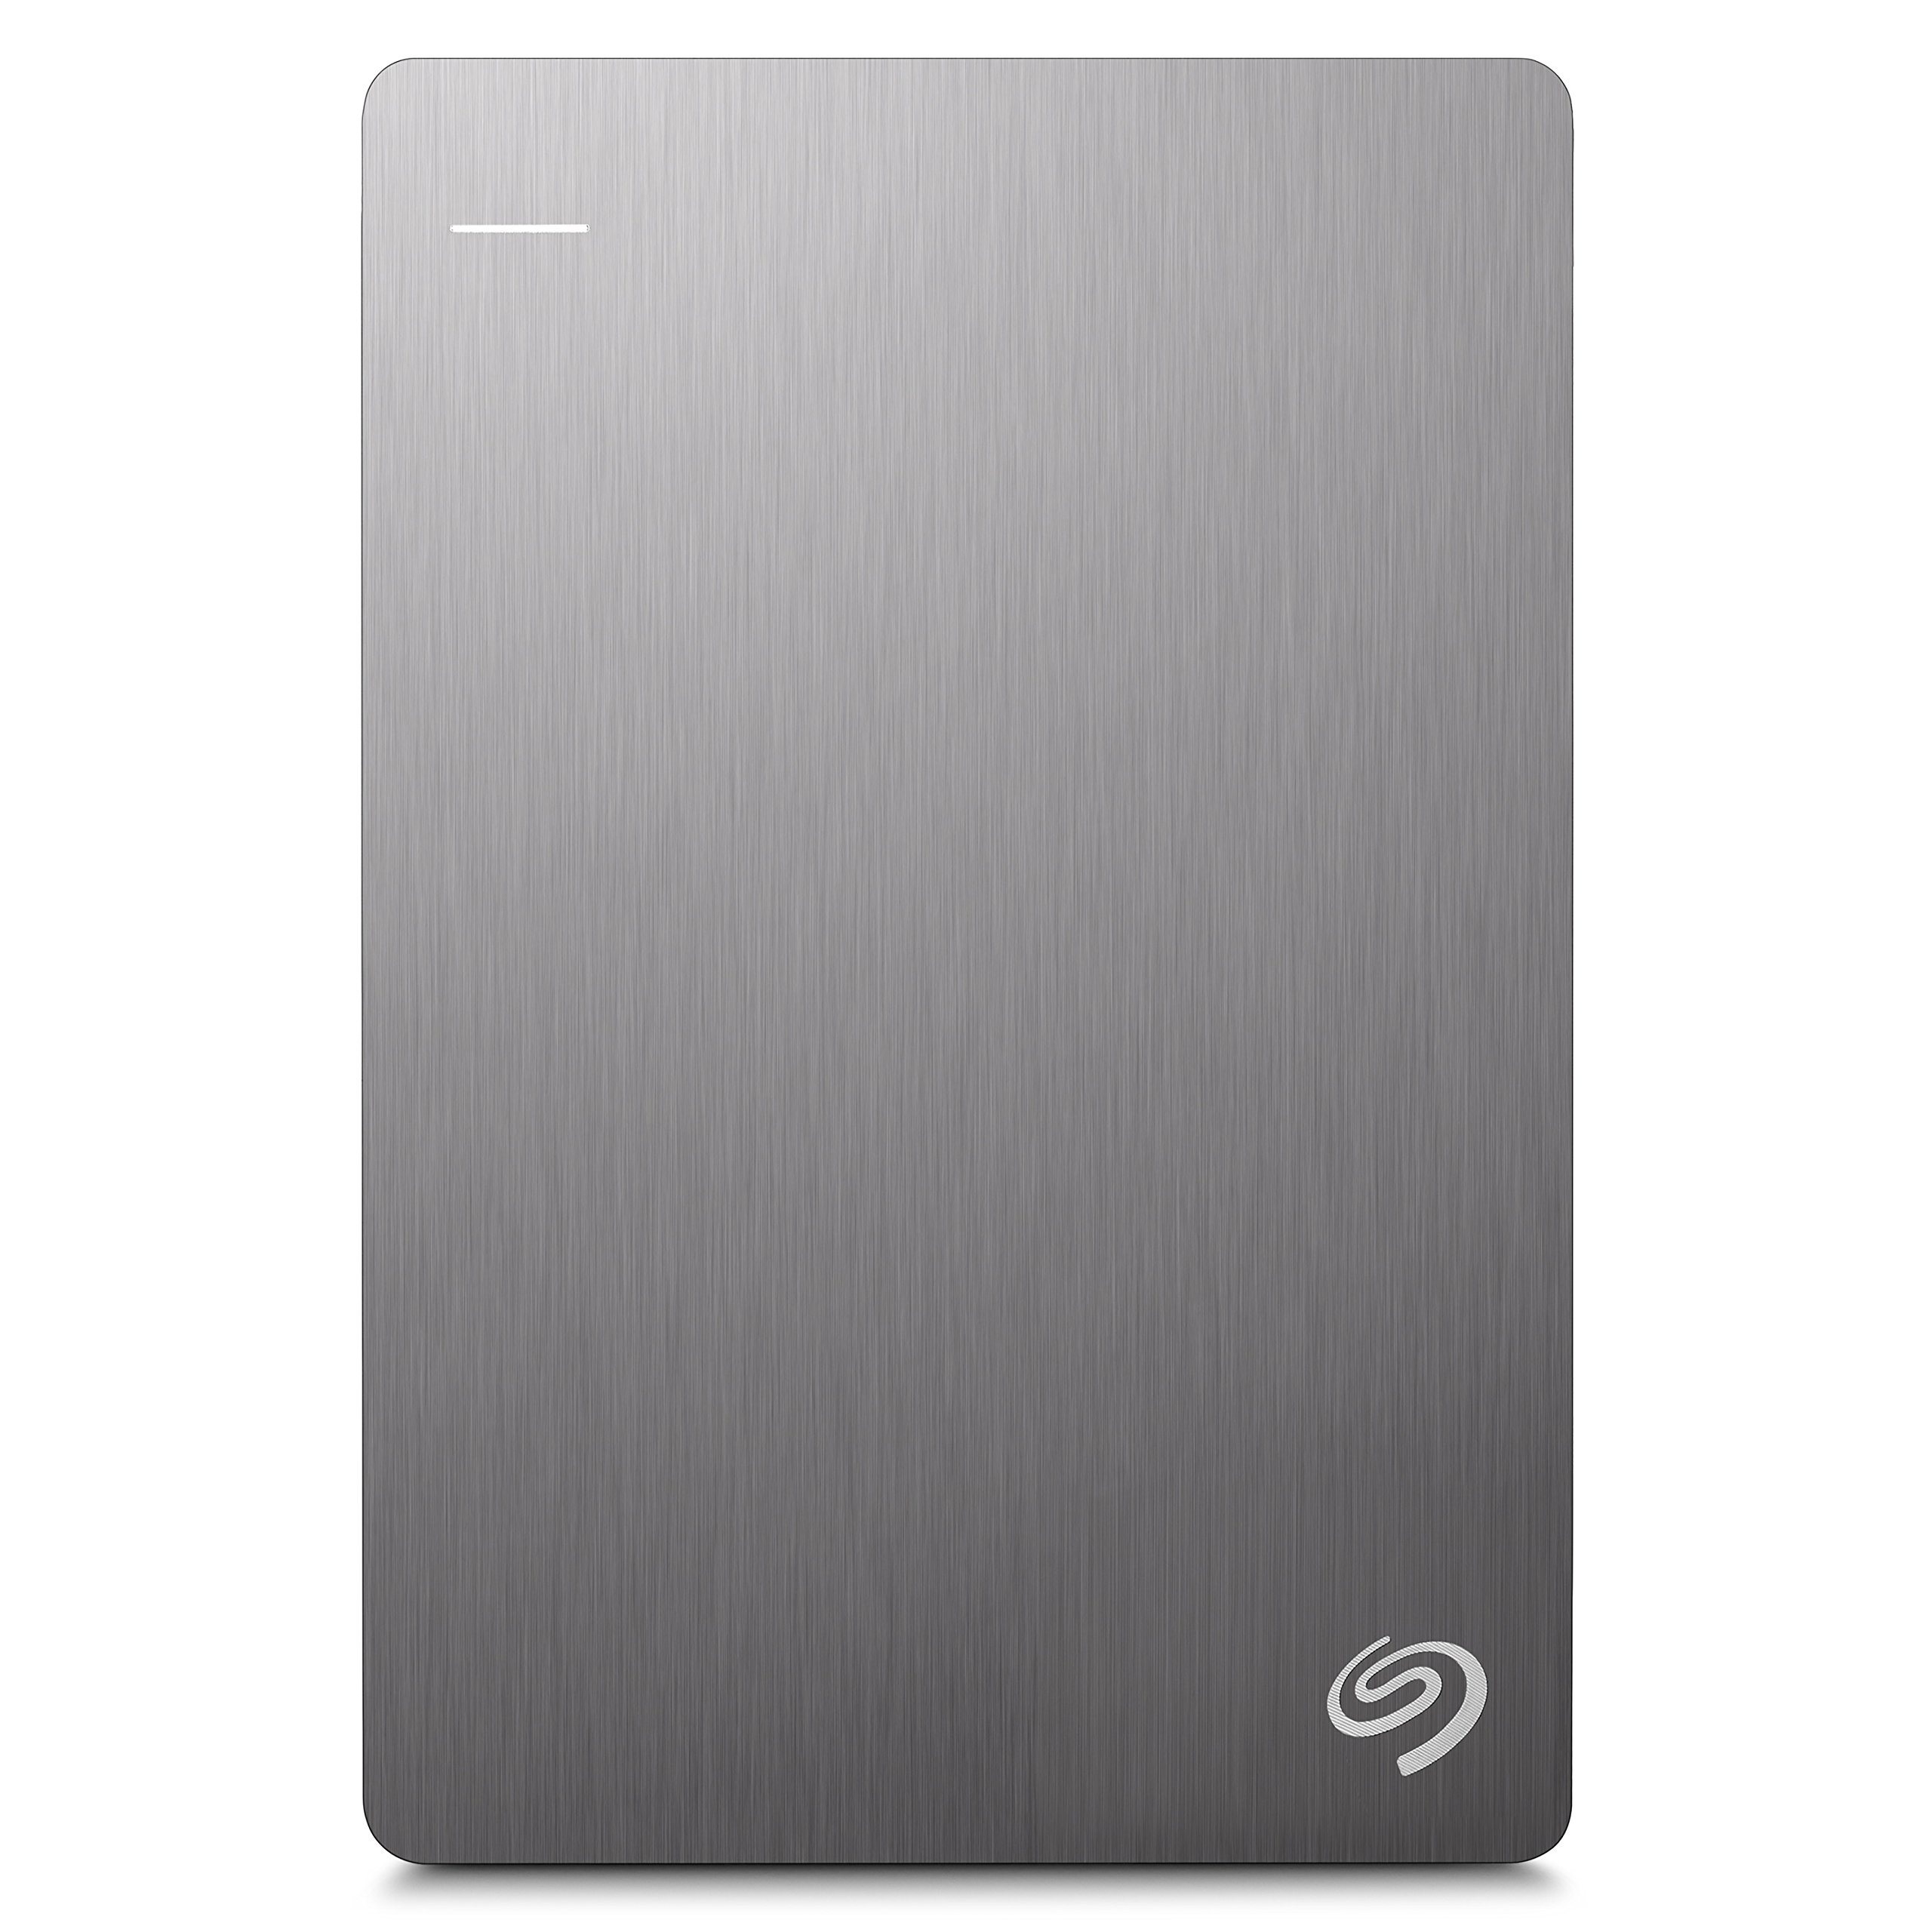 Seagate Backup Plus Slim - Disco duro externo portátil de 2.5' para PC y Mac (2 TB, USB 3.0) Plata